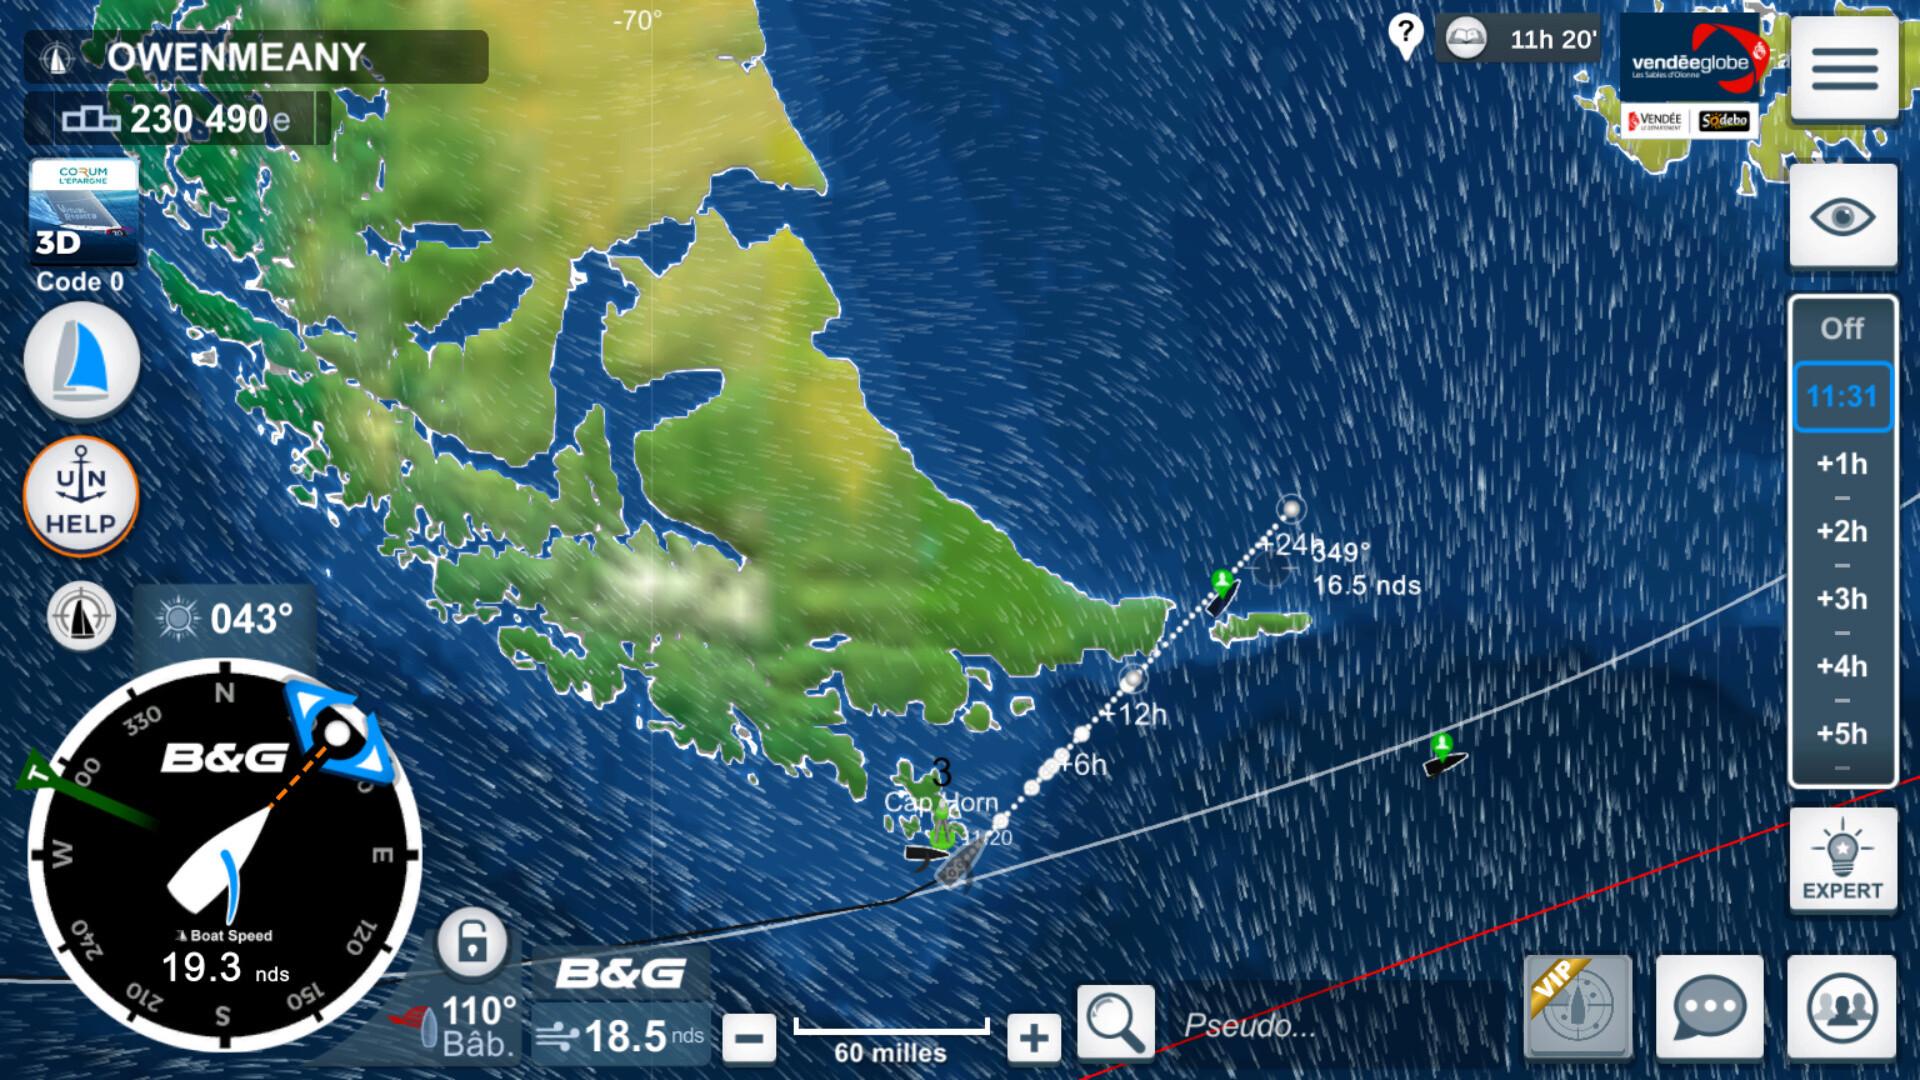 Vendée Globe virtuel: Virtual Regatta, édition 2020 - Page 2 Captur67